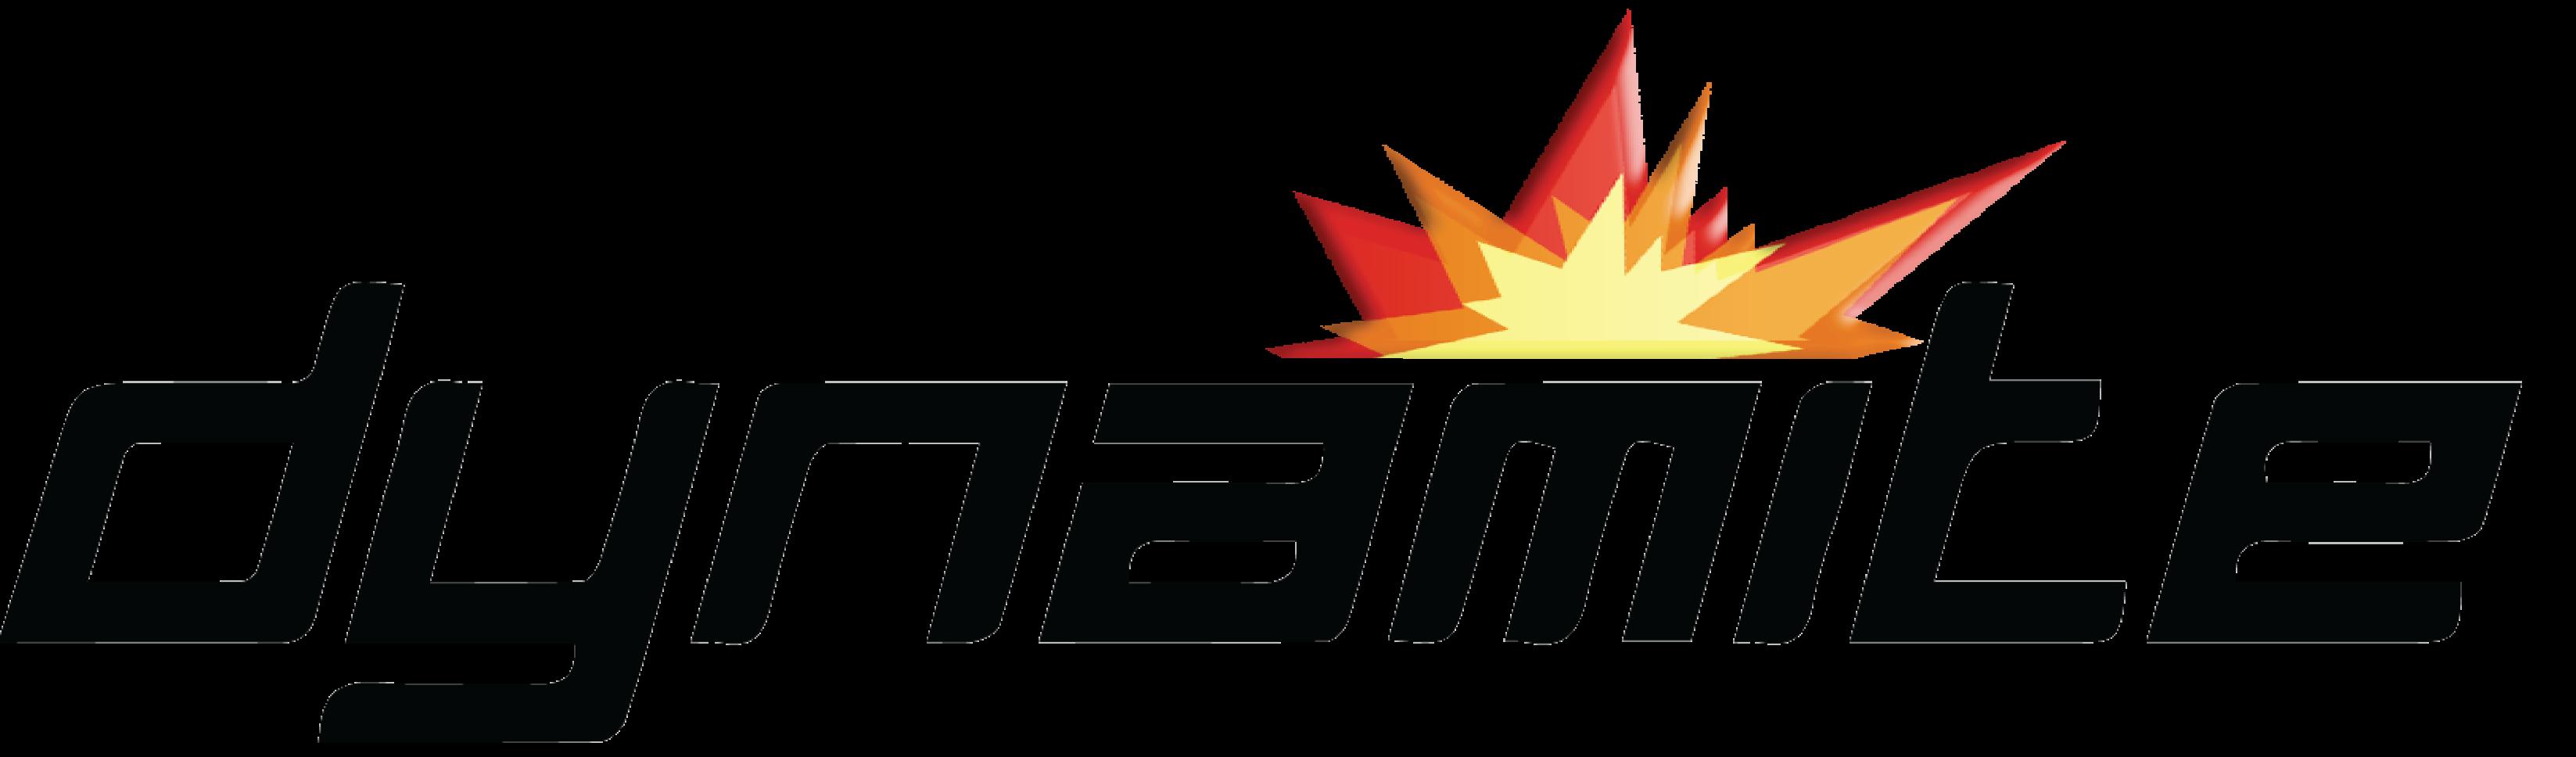 Team Dynamite Logo for NBC Created in Illustrator